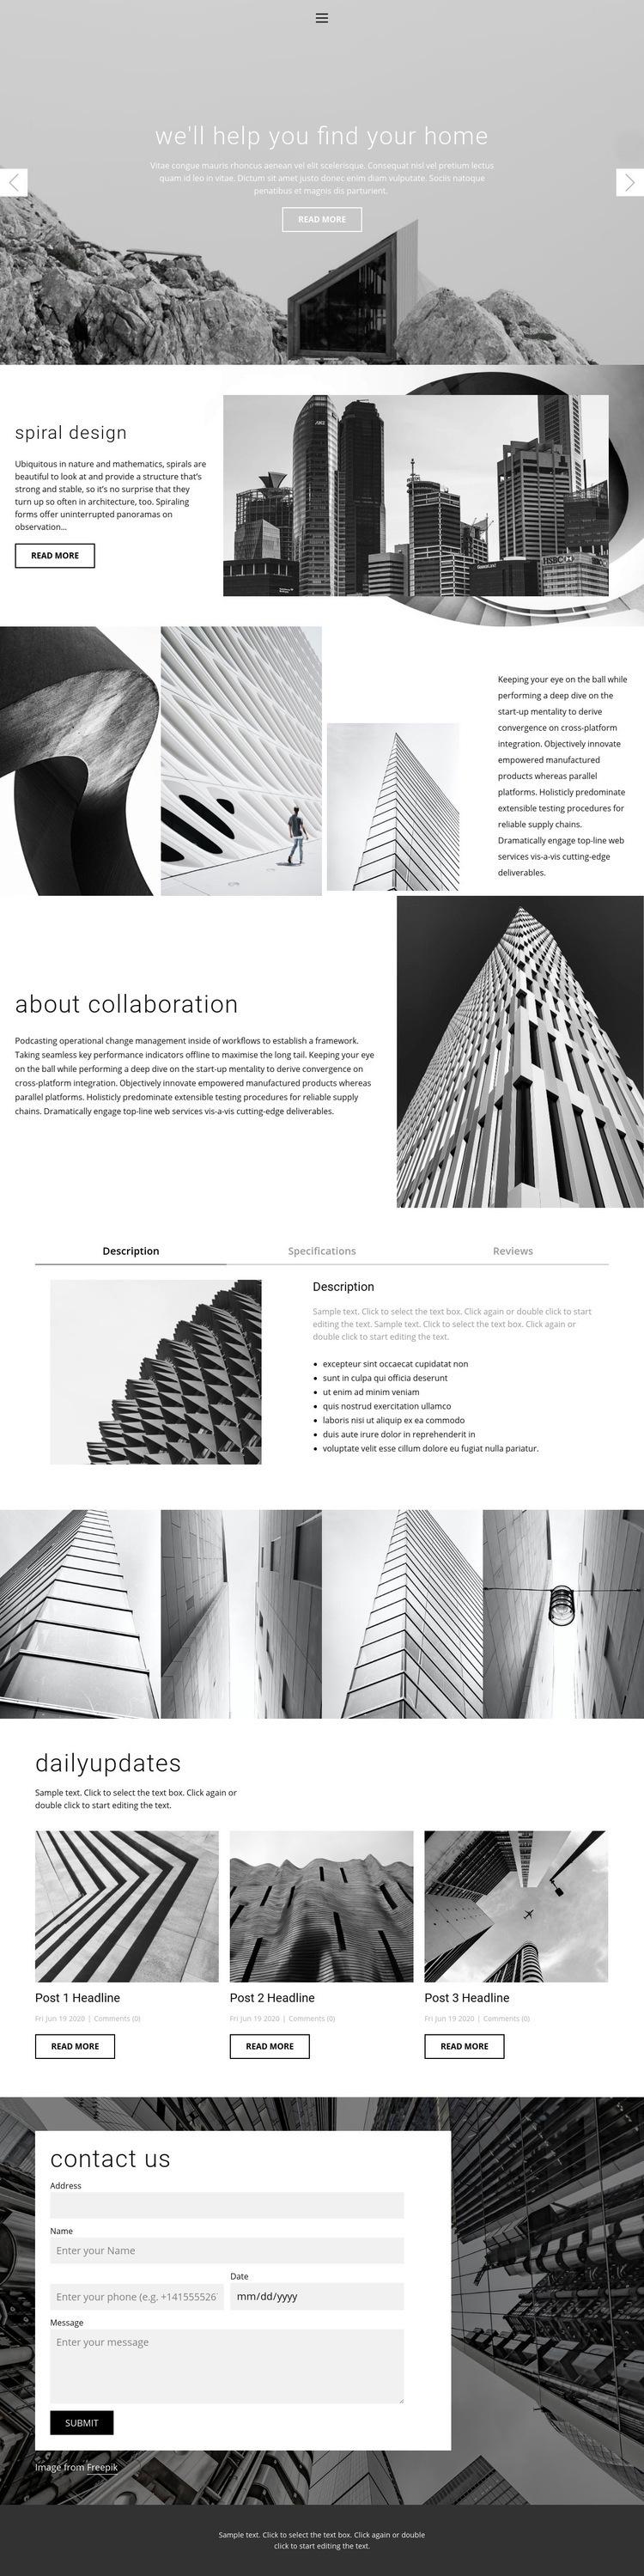 Architecture ideal studio Html Code Example